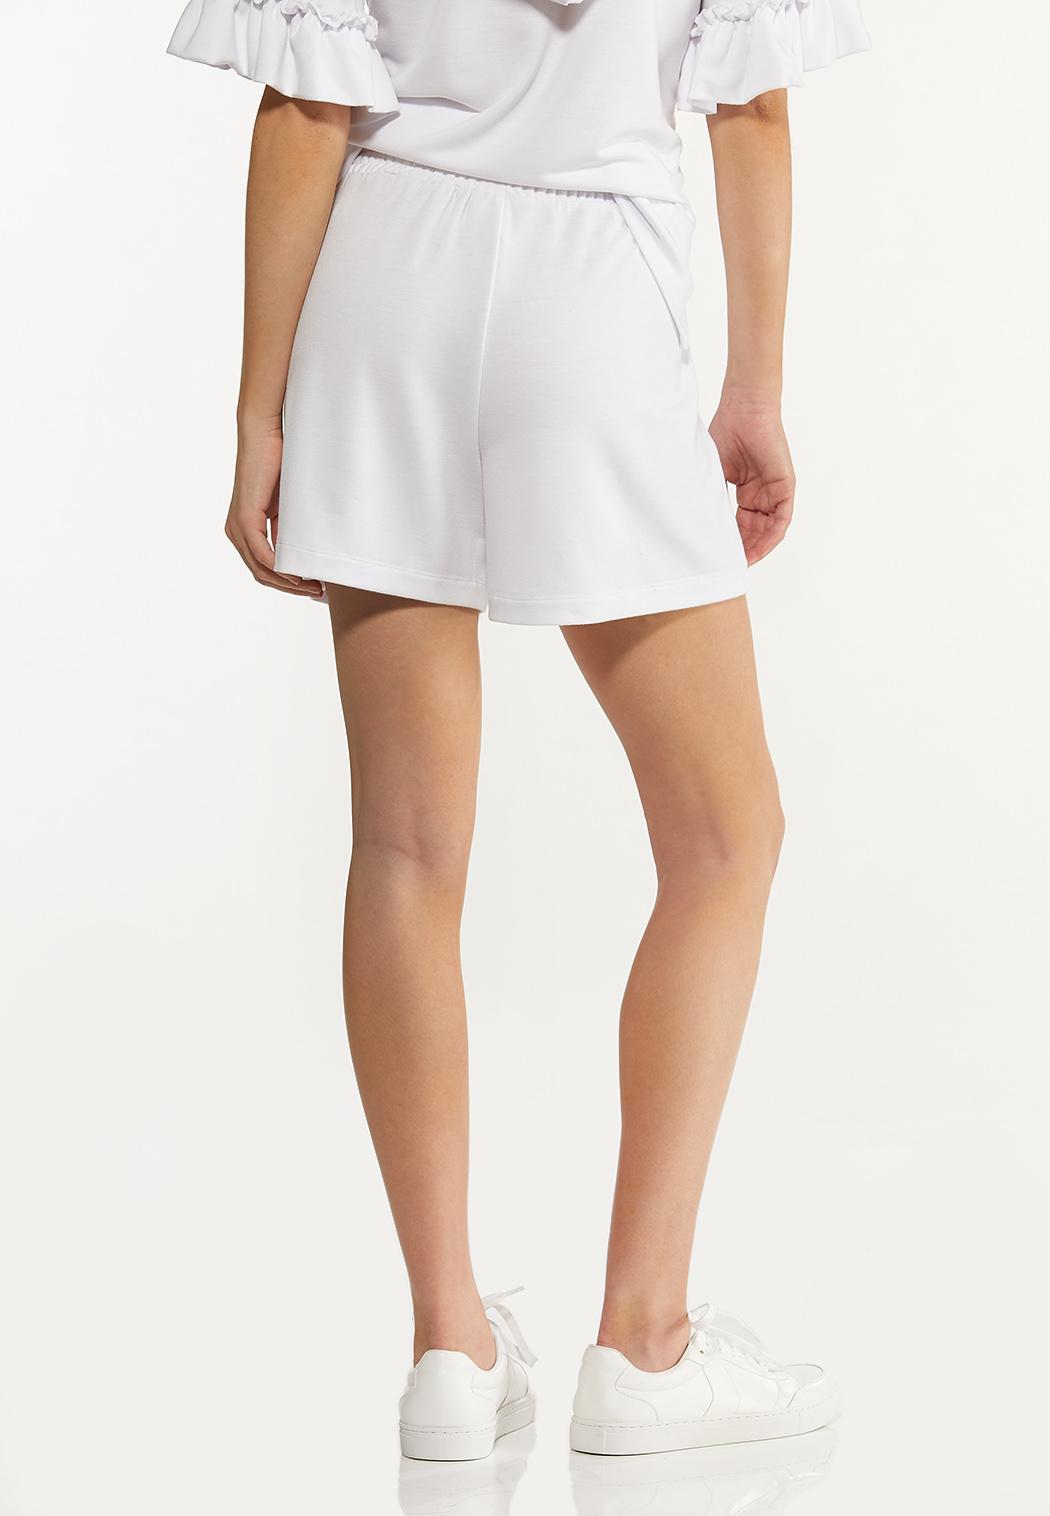 White Smocked Shorts (Item #44578033)